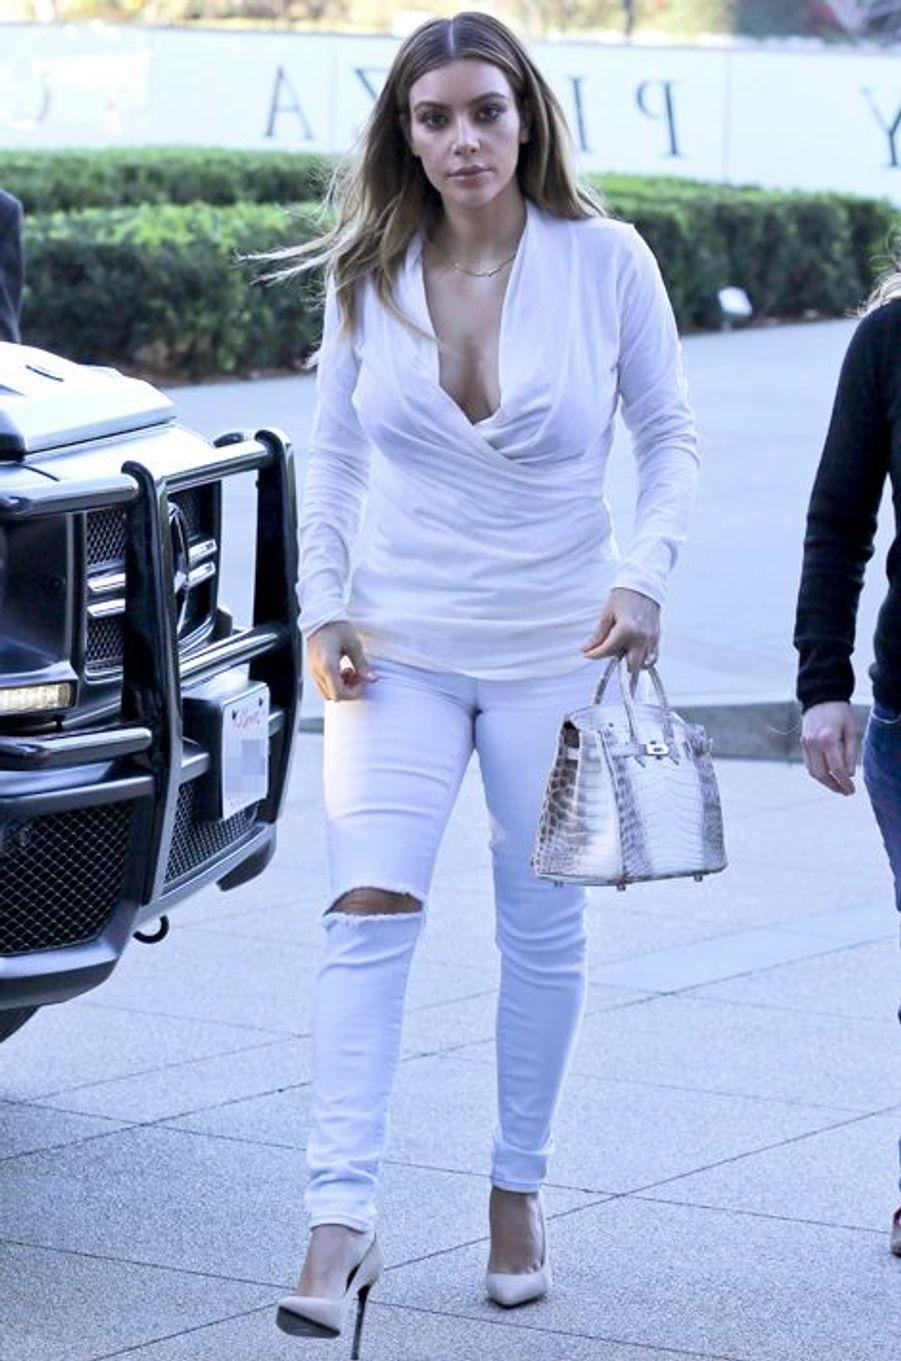 Kim Kardashian et son sac Birkin Croco blanc à Los Angeles le 10 janvier 2014.